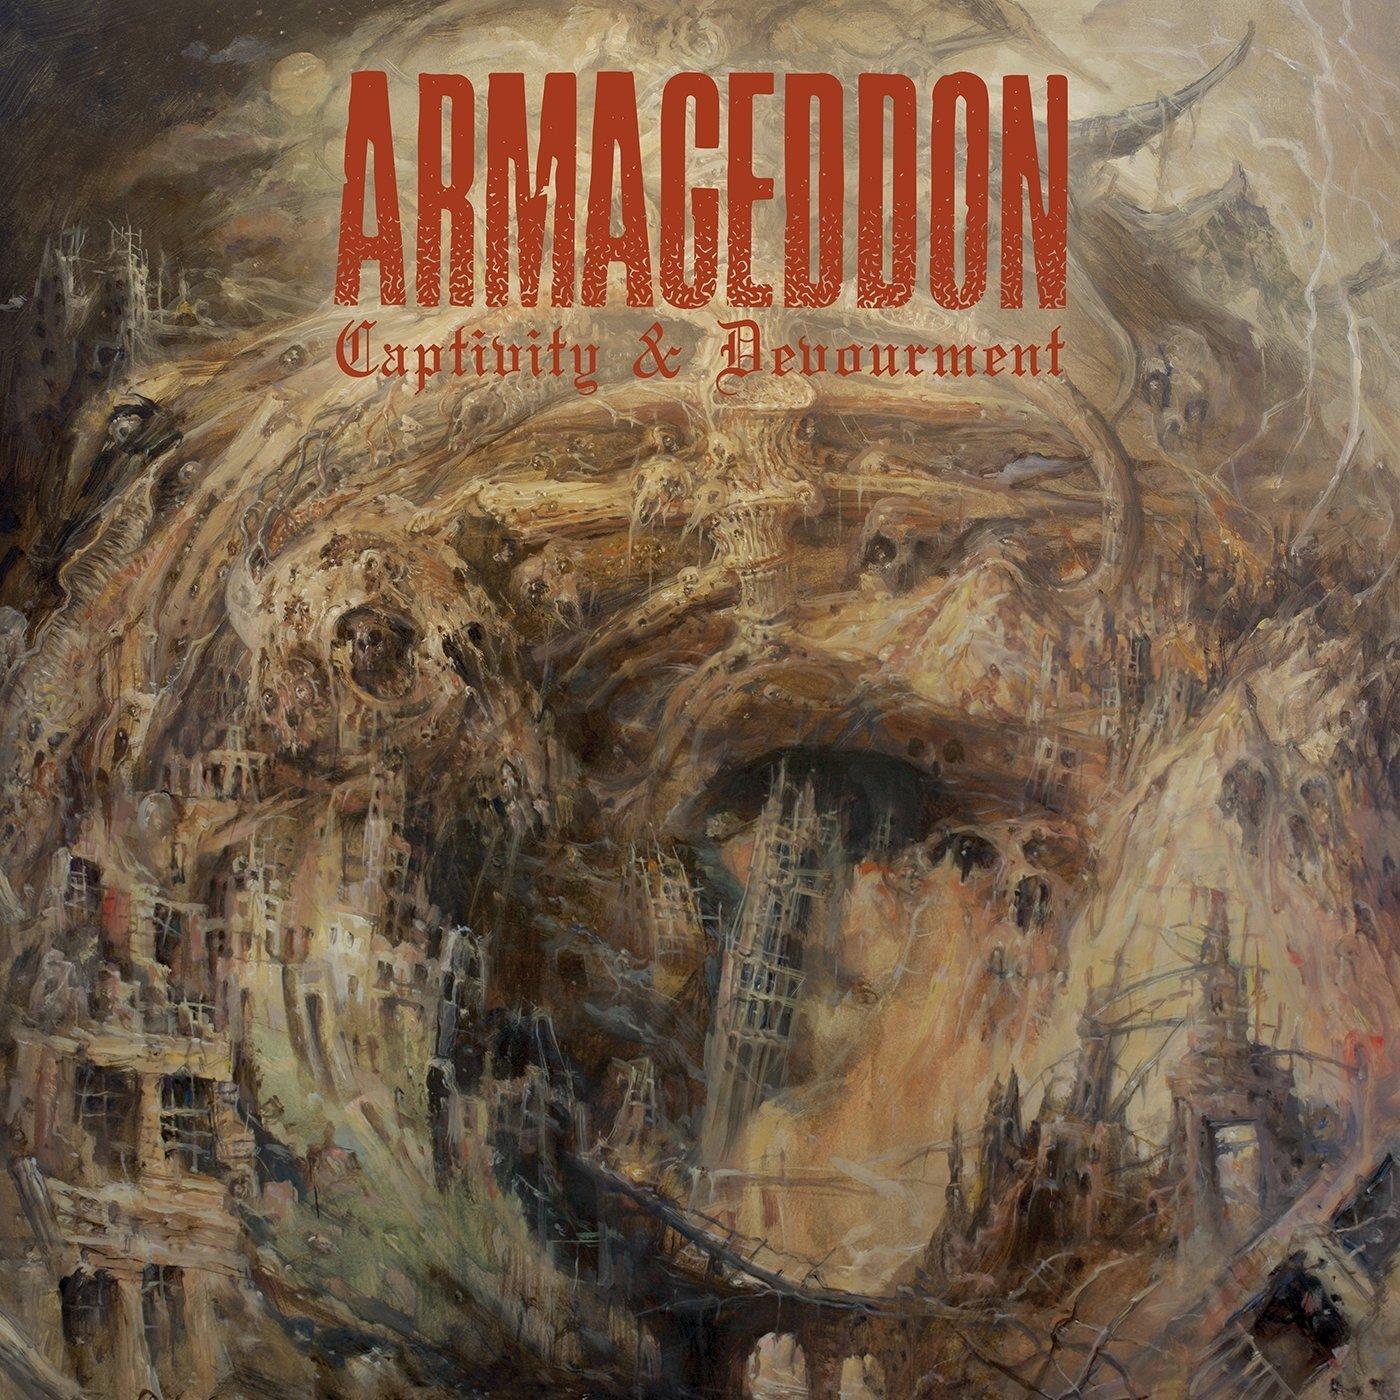 Die neuen Metal-Alben im Januar 2015 - Armageddon CAPTIVITY & DEVOURMENT